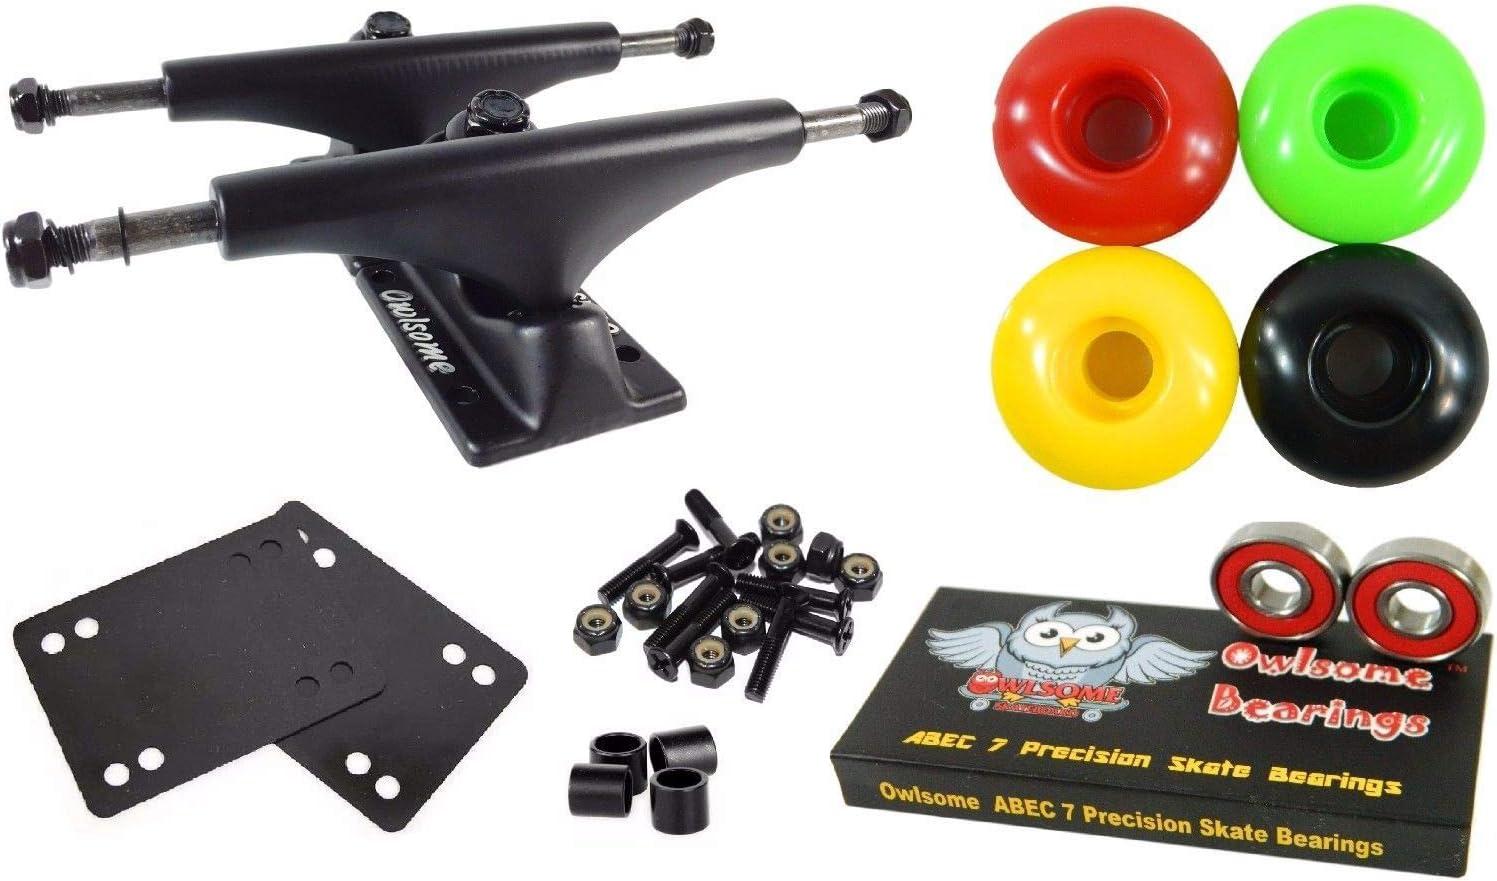 Columbus Mall Rasta 5.0 Black Skateboard Trucks Manufacturer regenerated product + Bearing 52Mm Wheels 7 ABEC